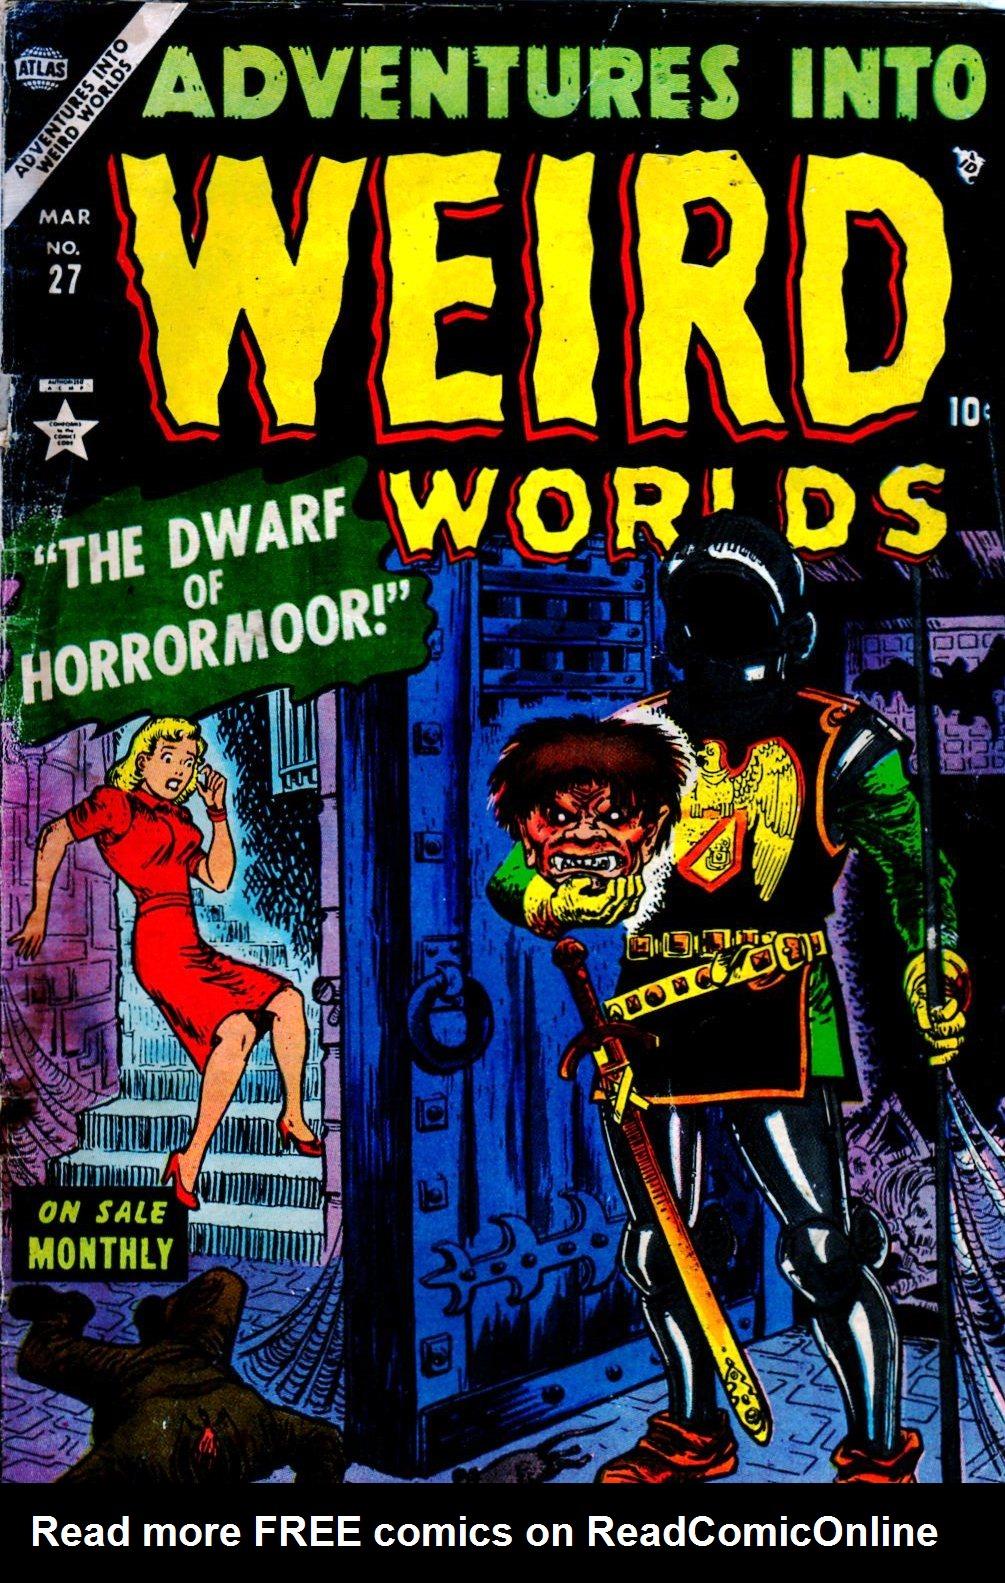 Read online Adventures into Weird Worlds comic -  Issue #27 - 2